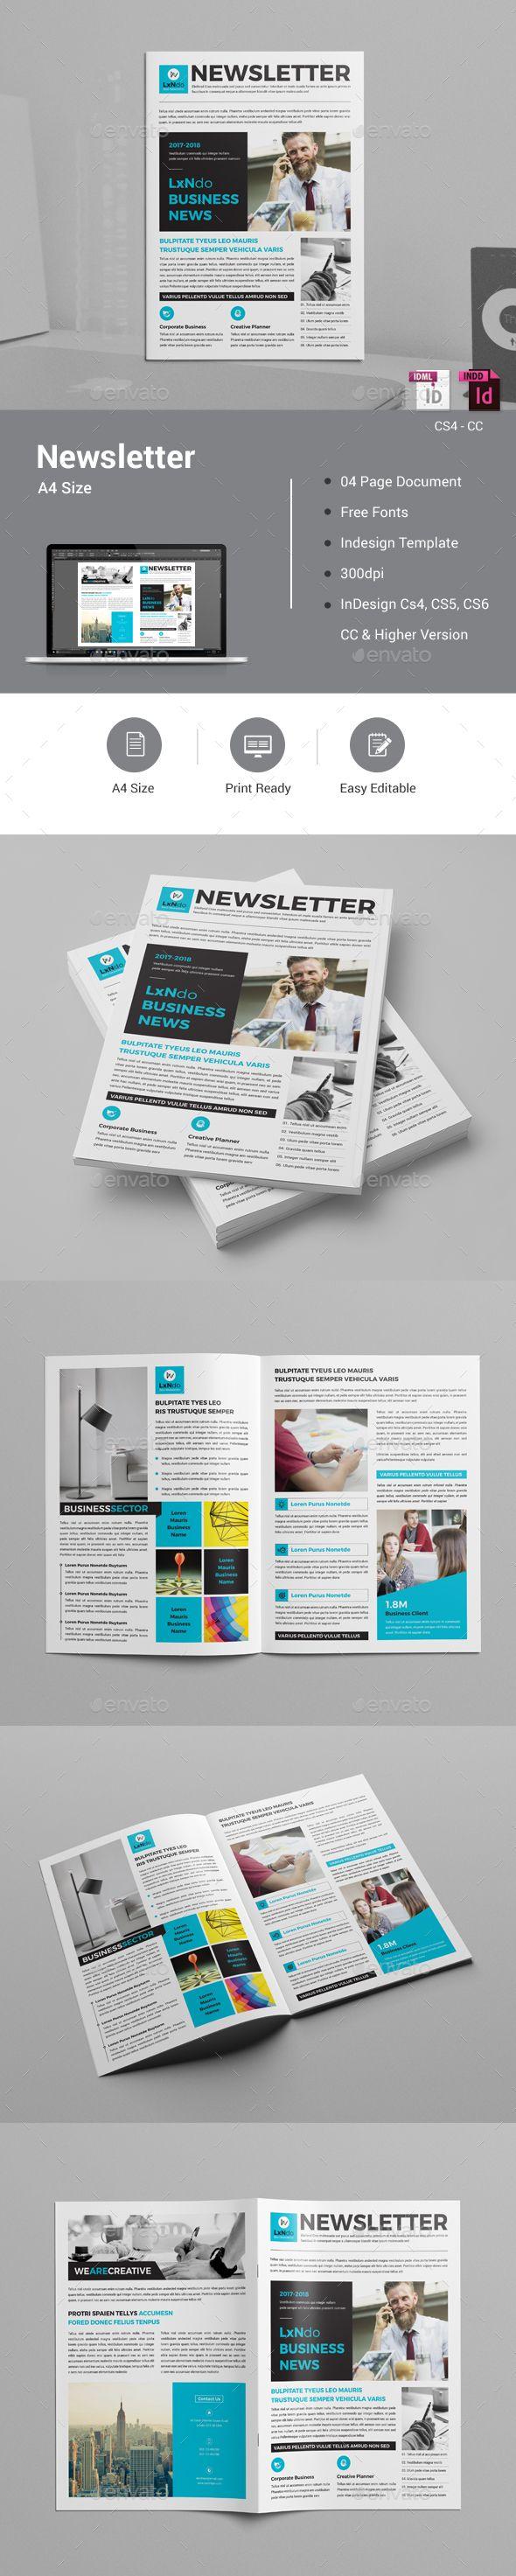 Newsletter Design Template InDesign INDD   Newsletter Template ...